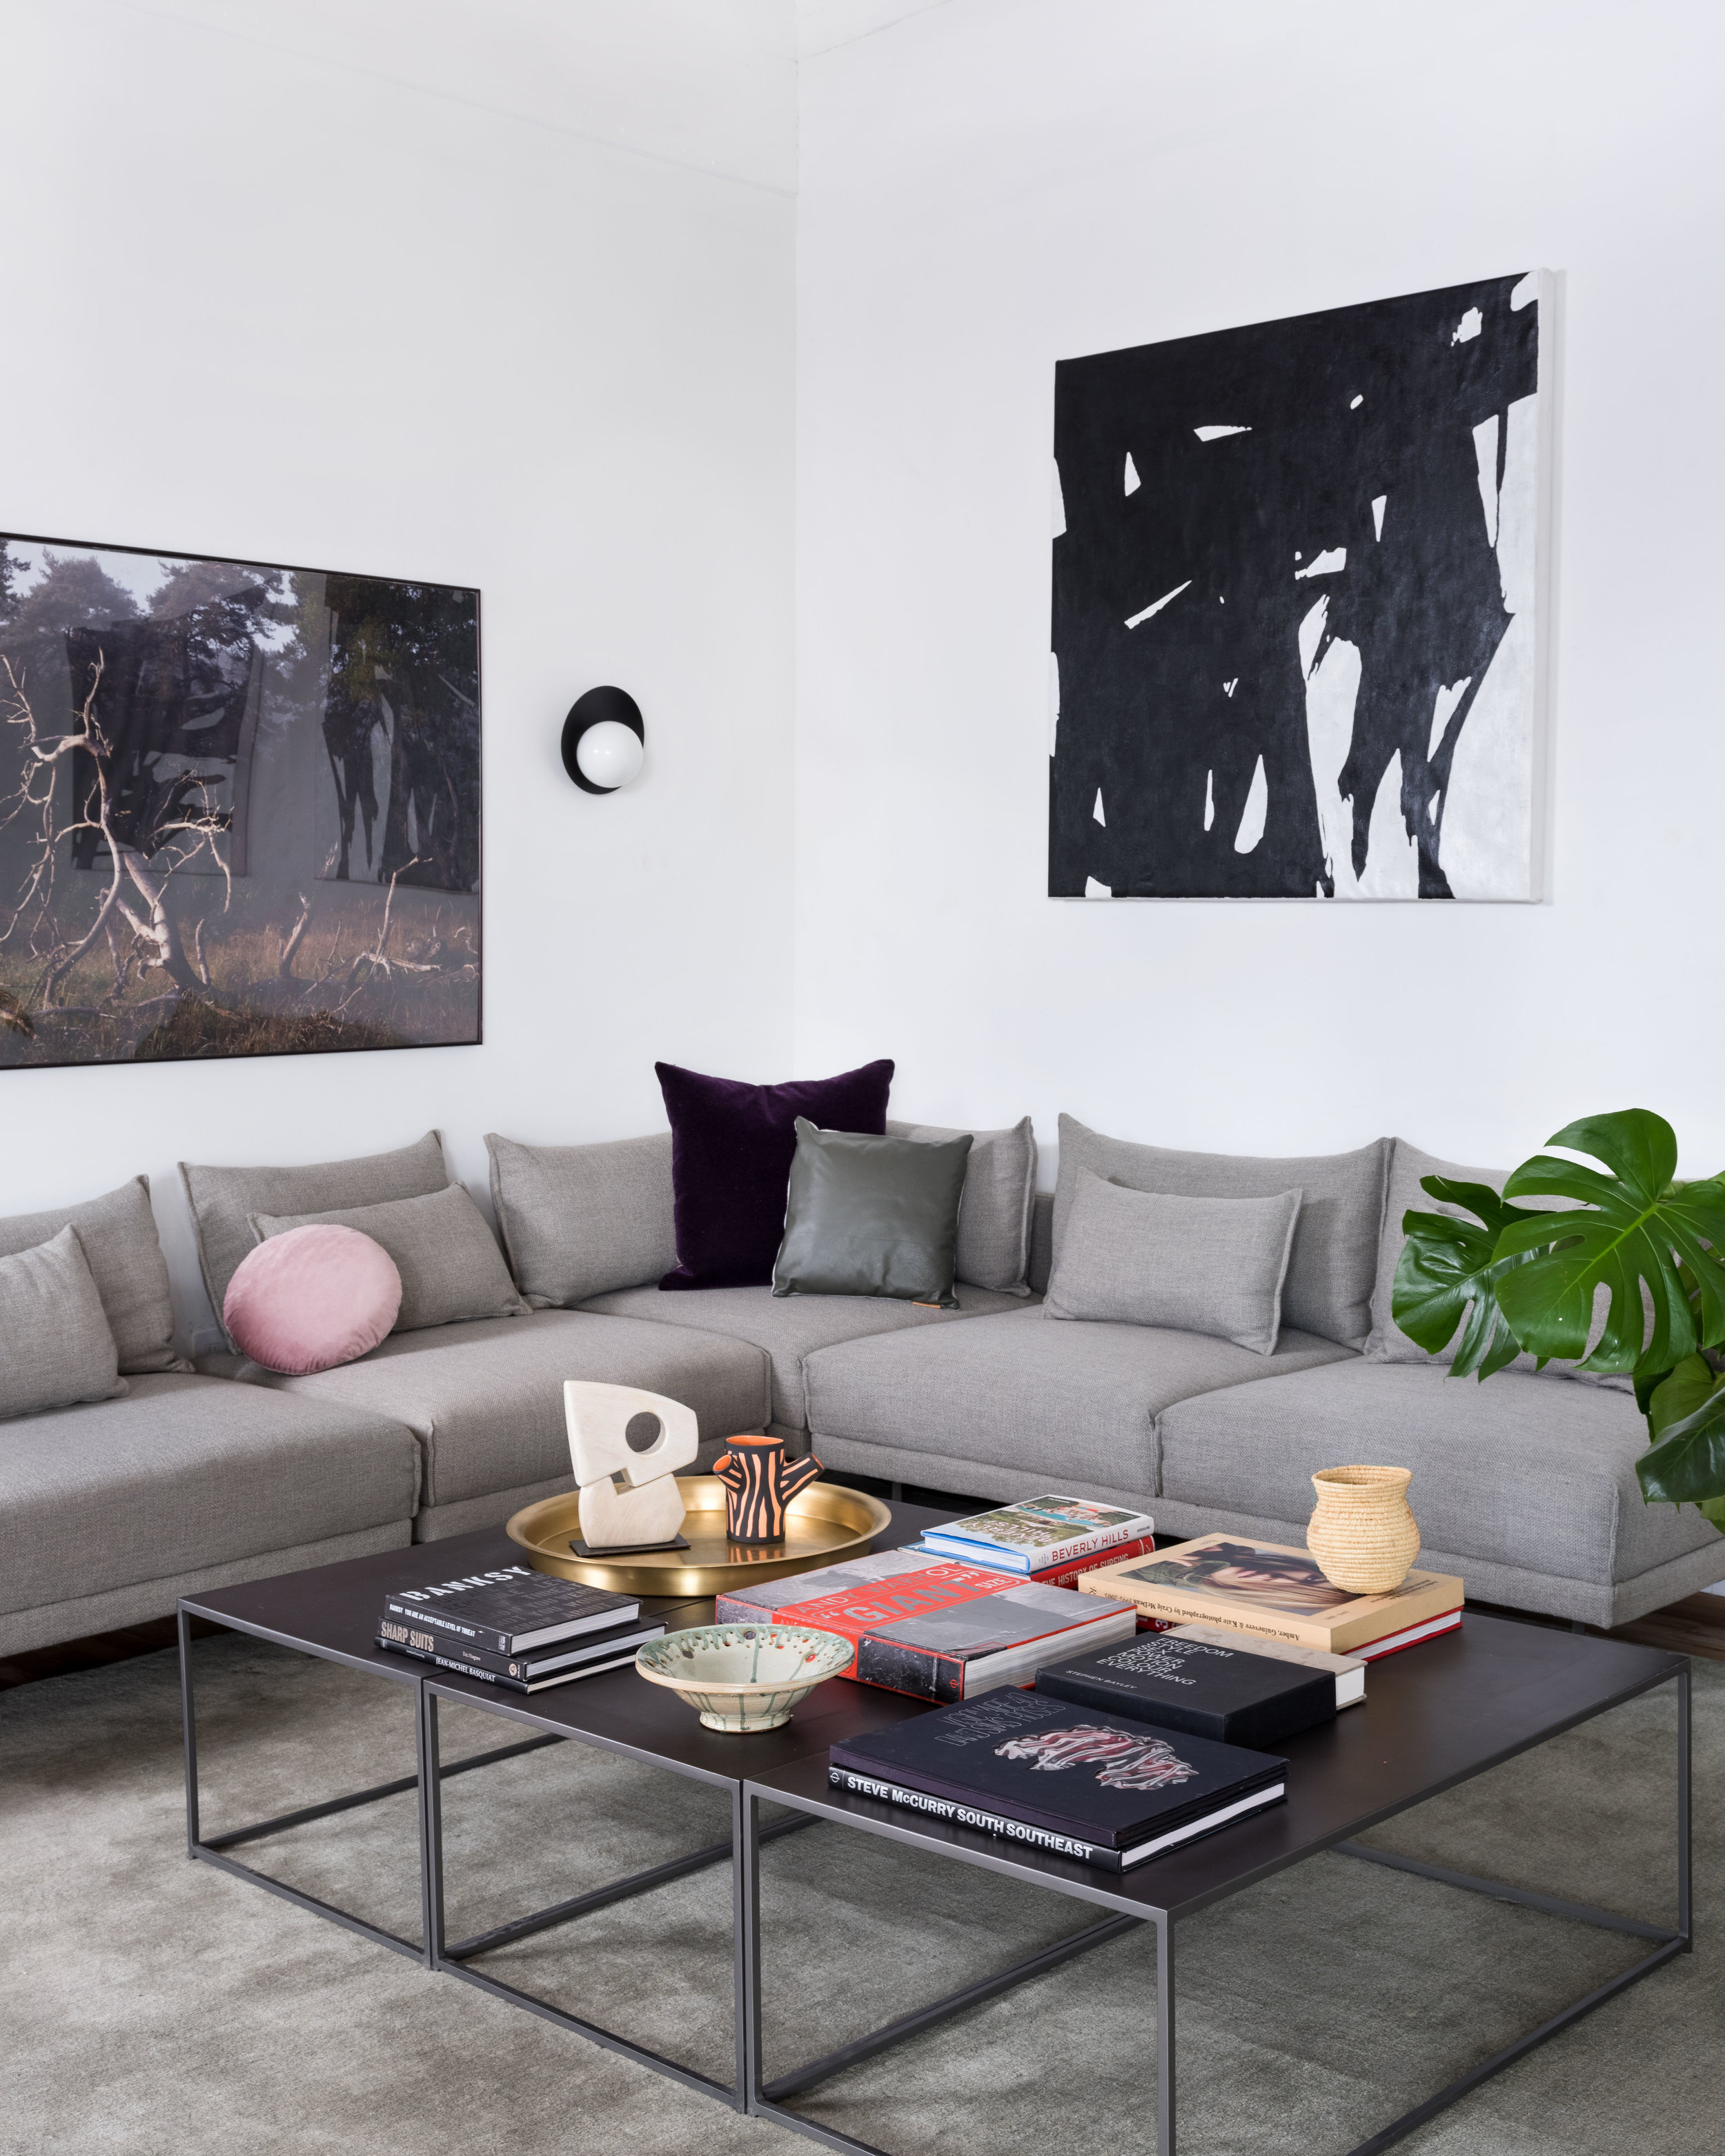 SLATE Studios - Tali Roth Designs